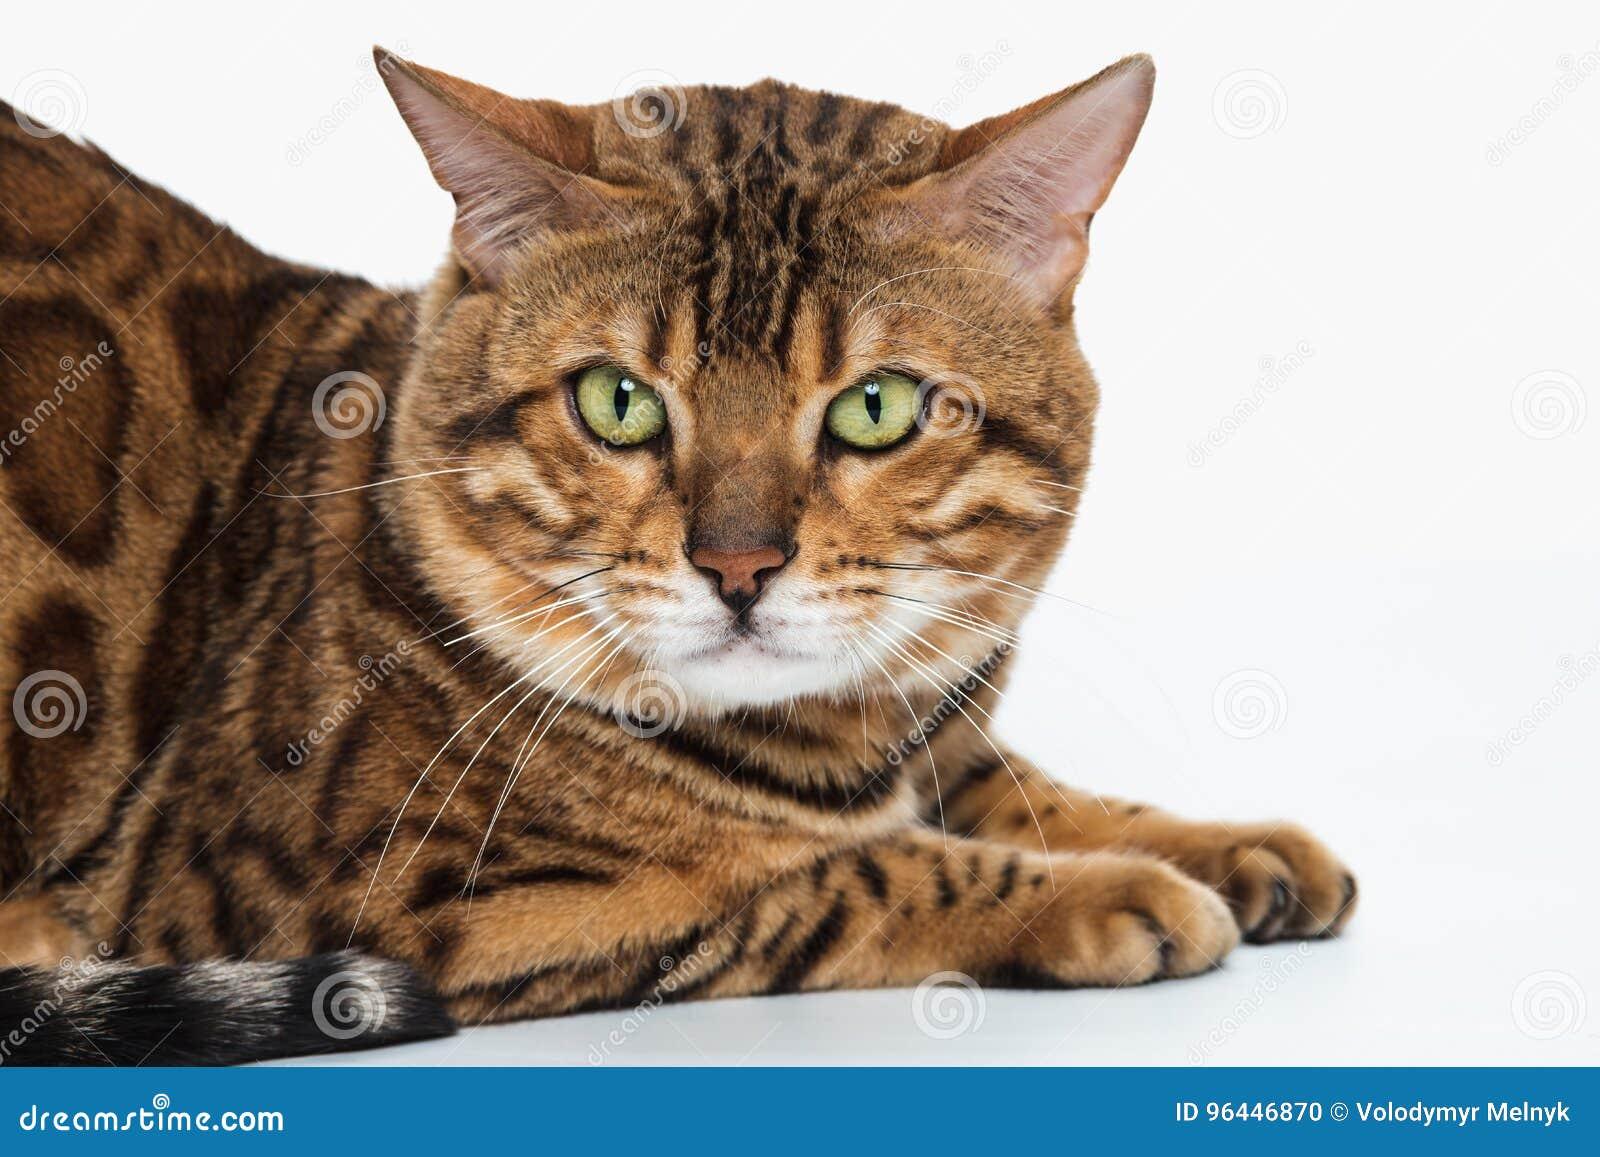 2be76e6b333e Η χρυσή γάτα της Βεγγάλης στο άσπρο υπόβαθρο Στοκ Εικόνες - εικόνα ...